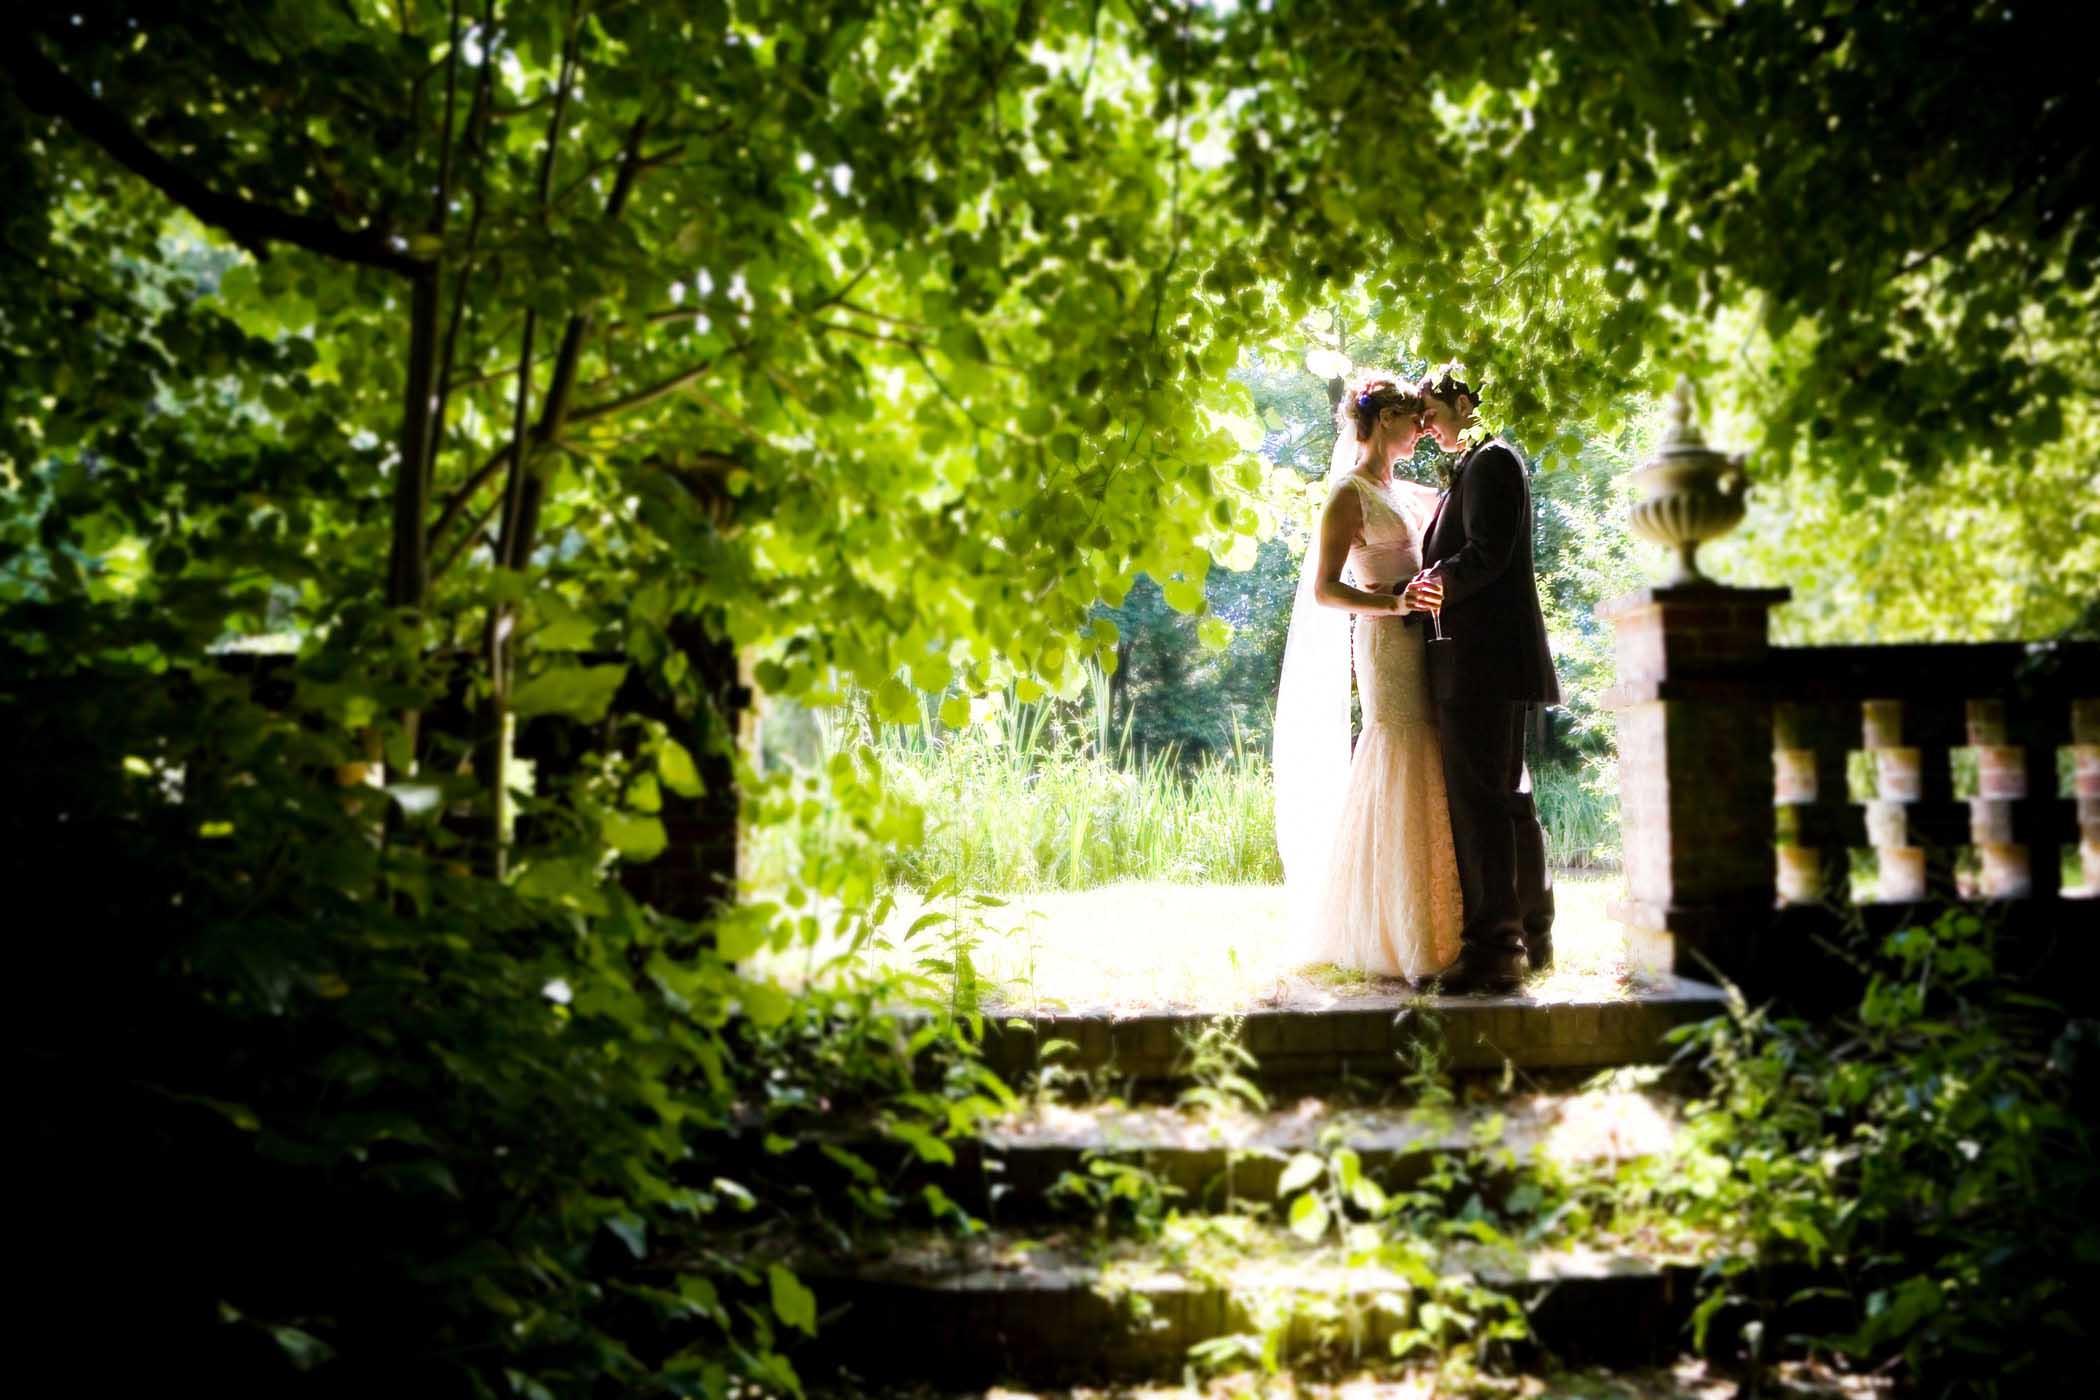 dan_burman_wedding_photography (2).jpg